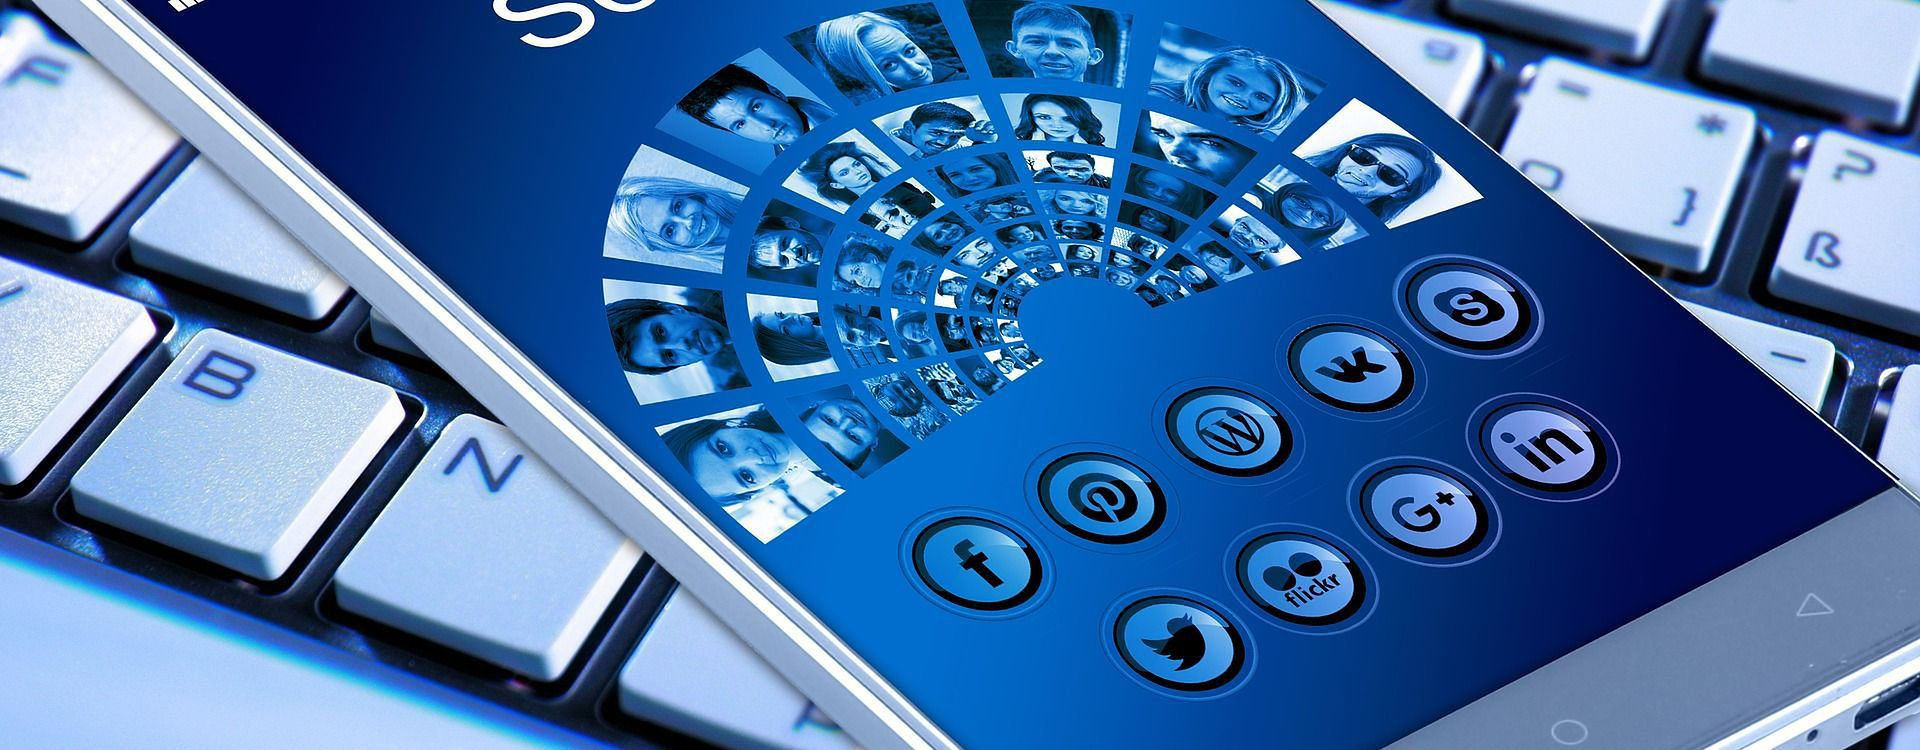 Smartfon z dostępem do Internetu